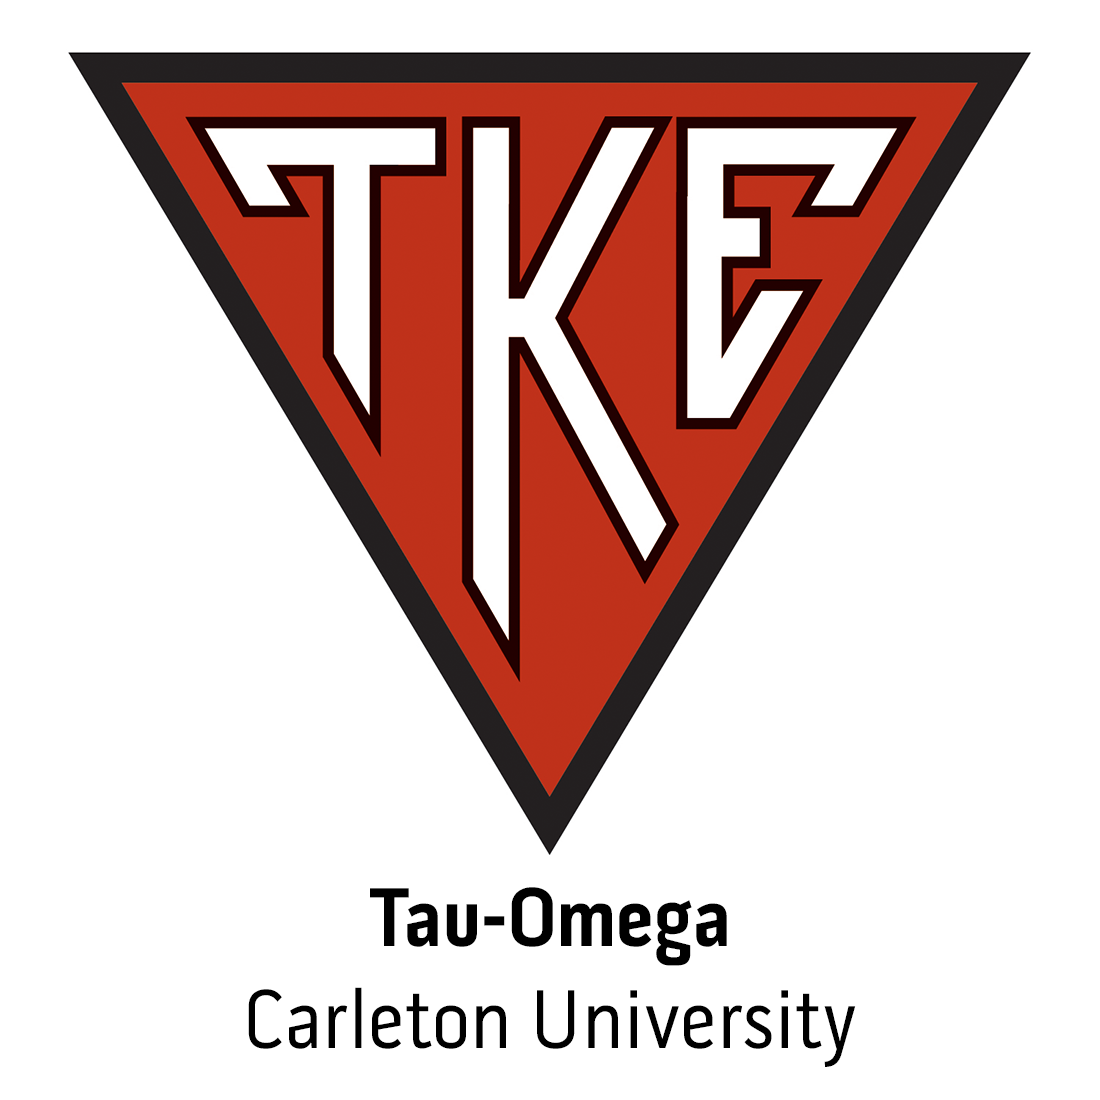 Tau-Omega Chapter at Carleton University